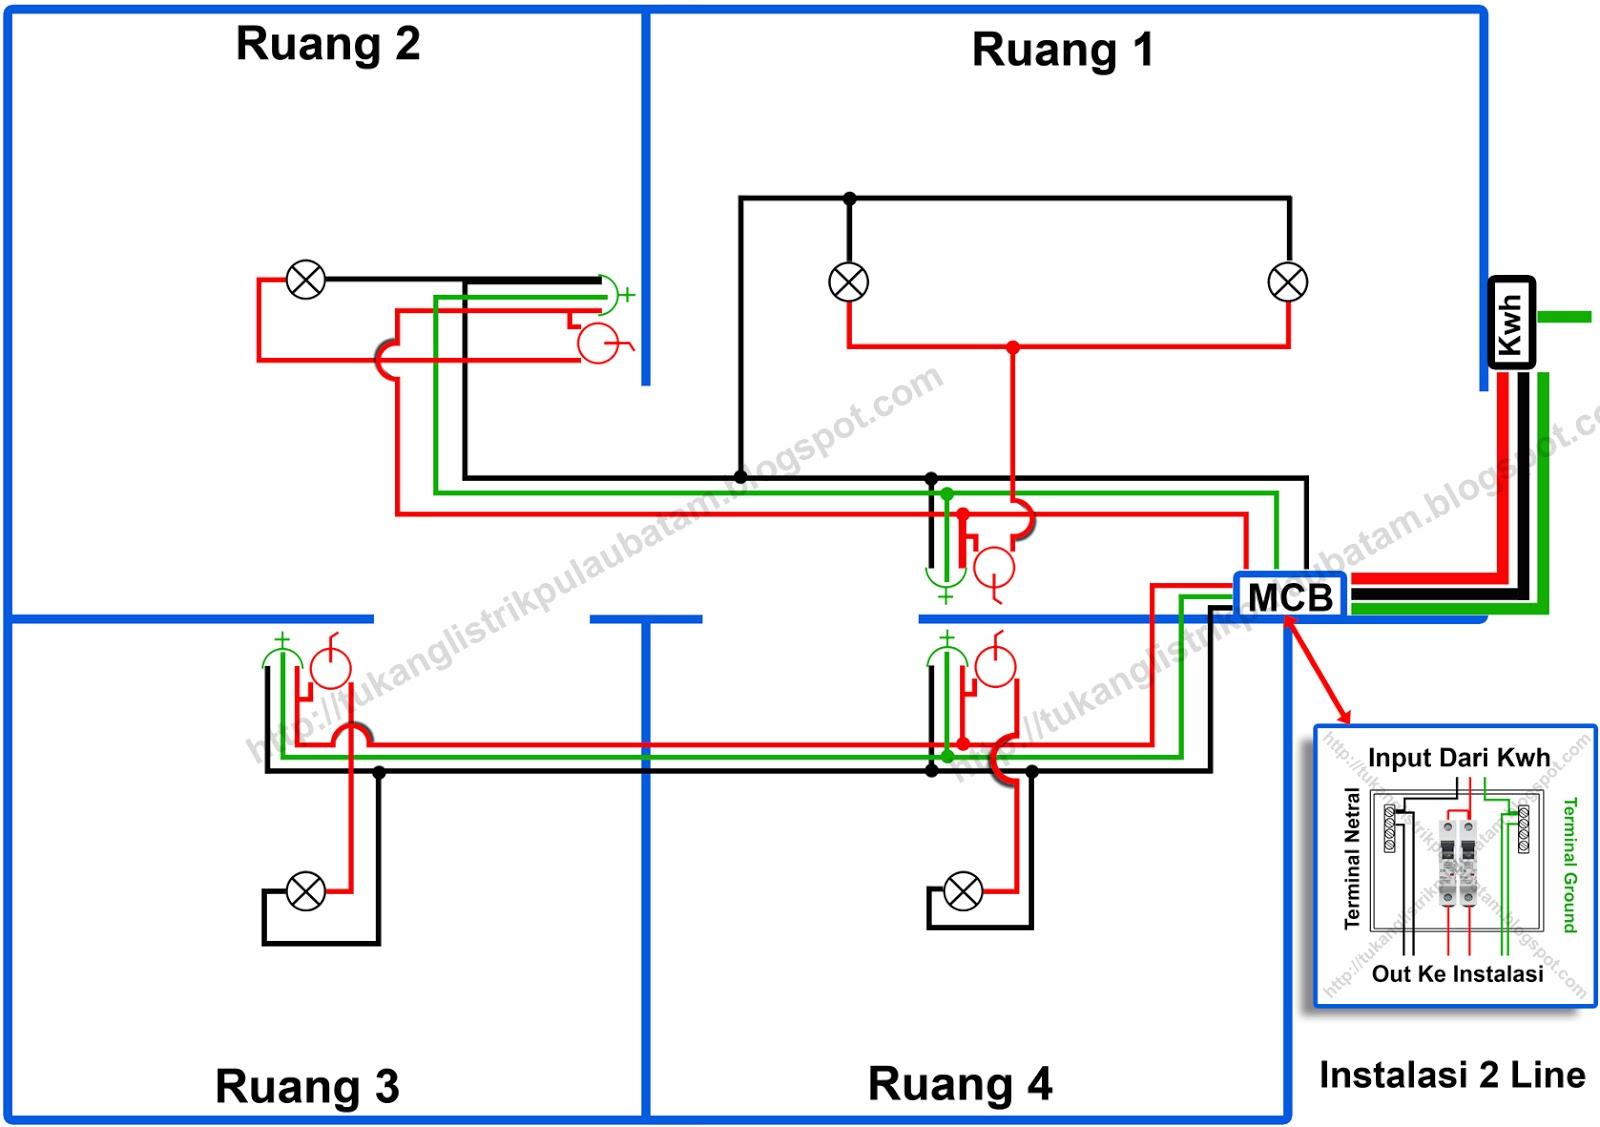 Wiring diagram rumah wire center tukang listrik batam listrik 1 phase rh tukanglistrikpulaubatam blogspot com contoh wiring diagram rumah wiring diagram cheapraybanclubmaster Images